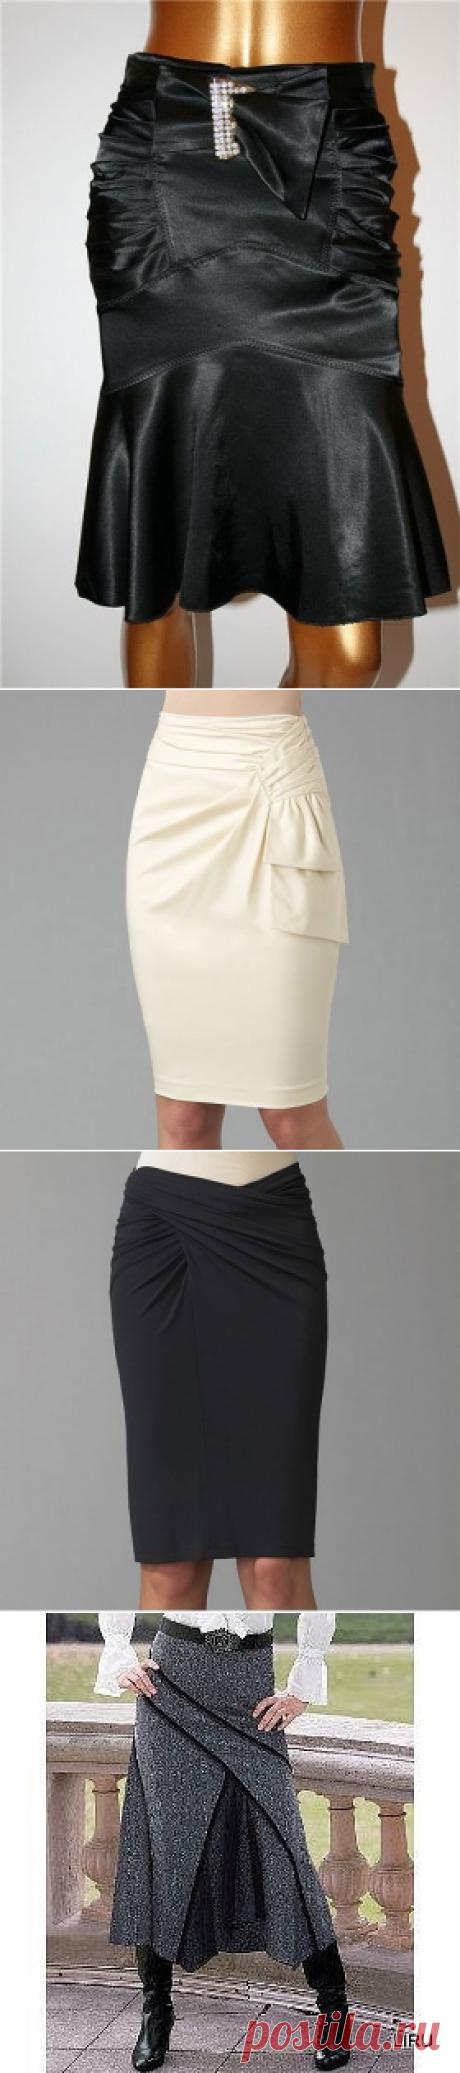 We sew a skirt